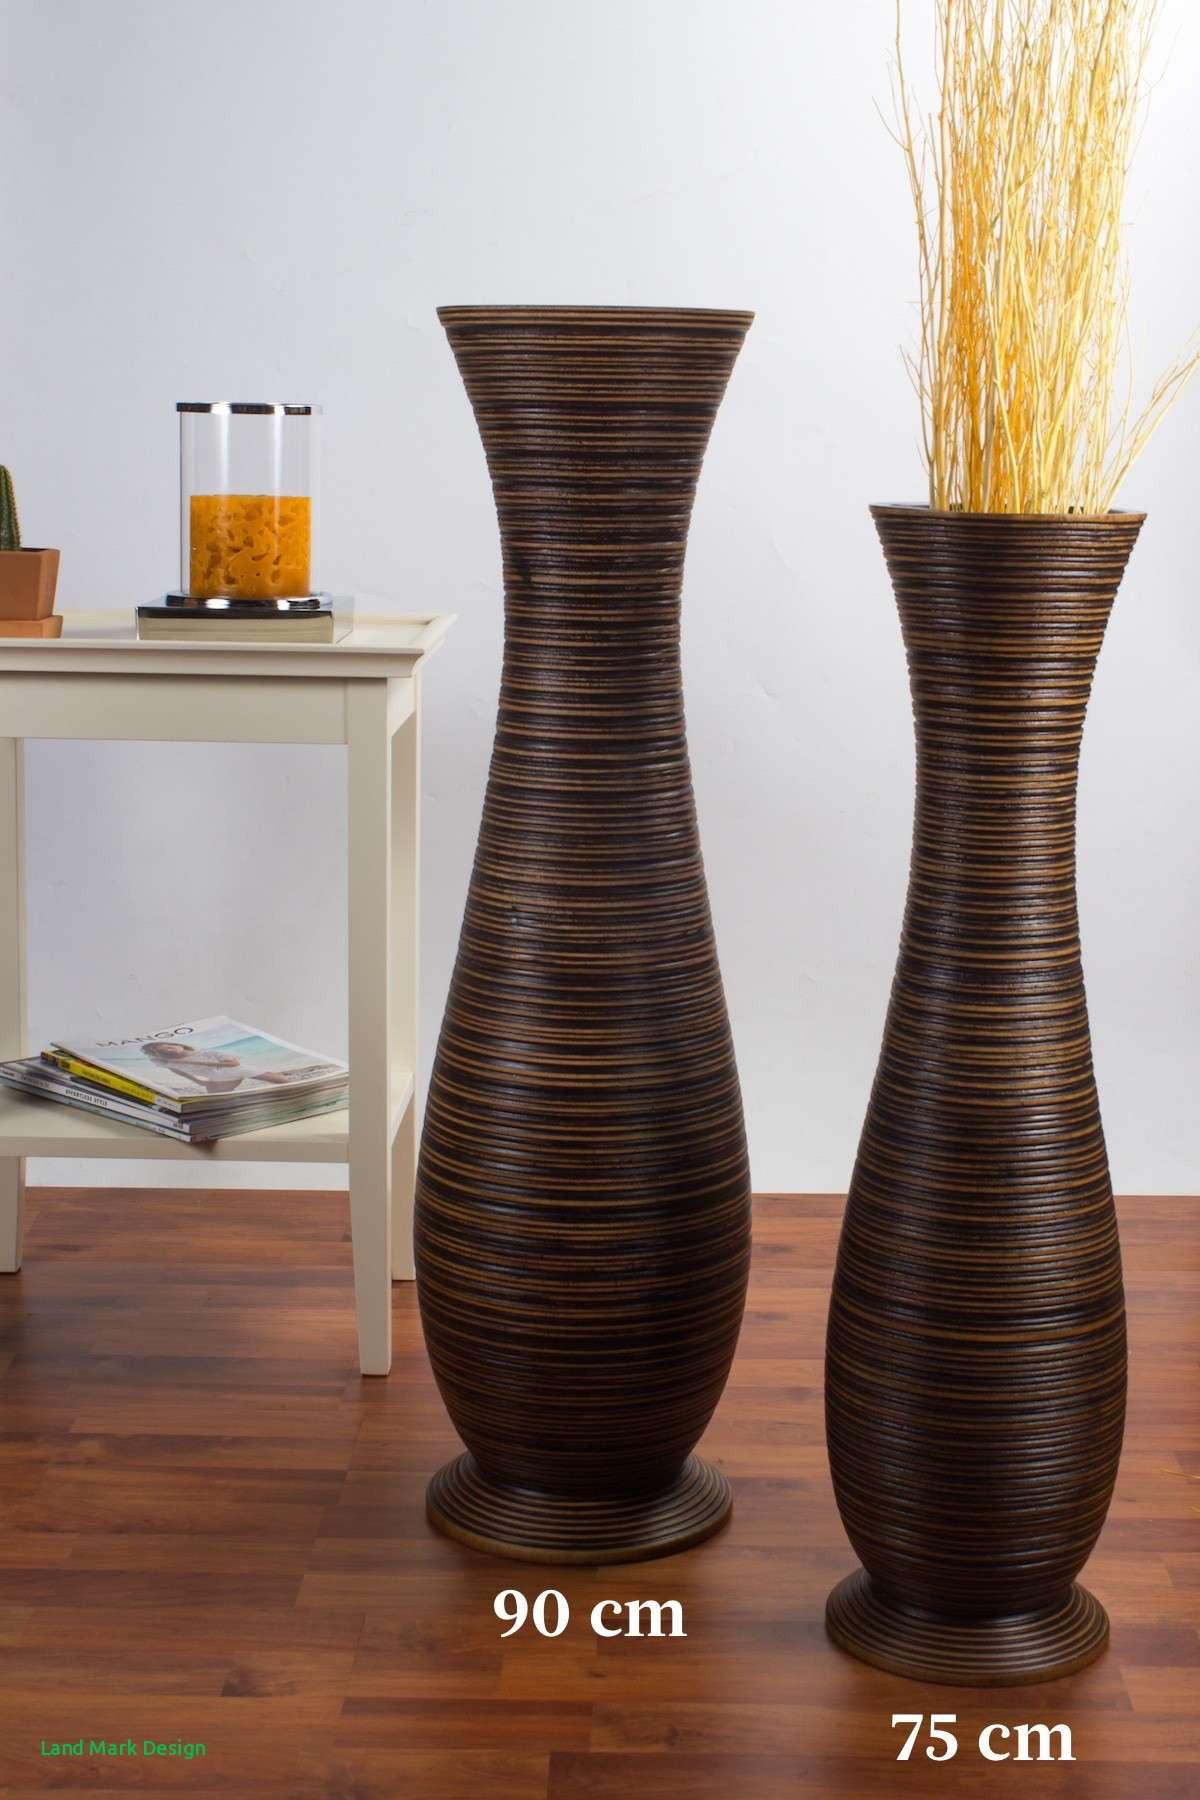 wicker floor vase of wicker vase tall pictures tall wicker vase design vases intended for tall wicker vase design